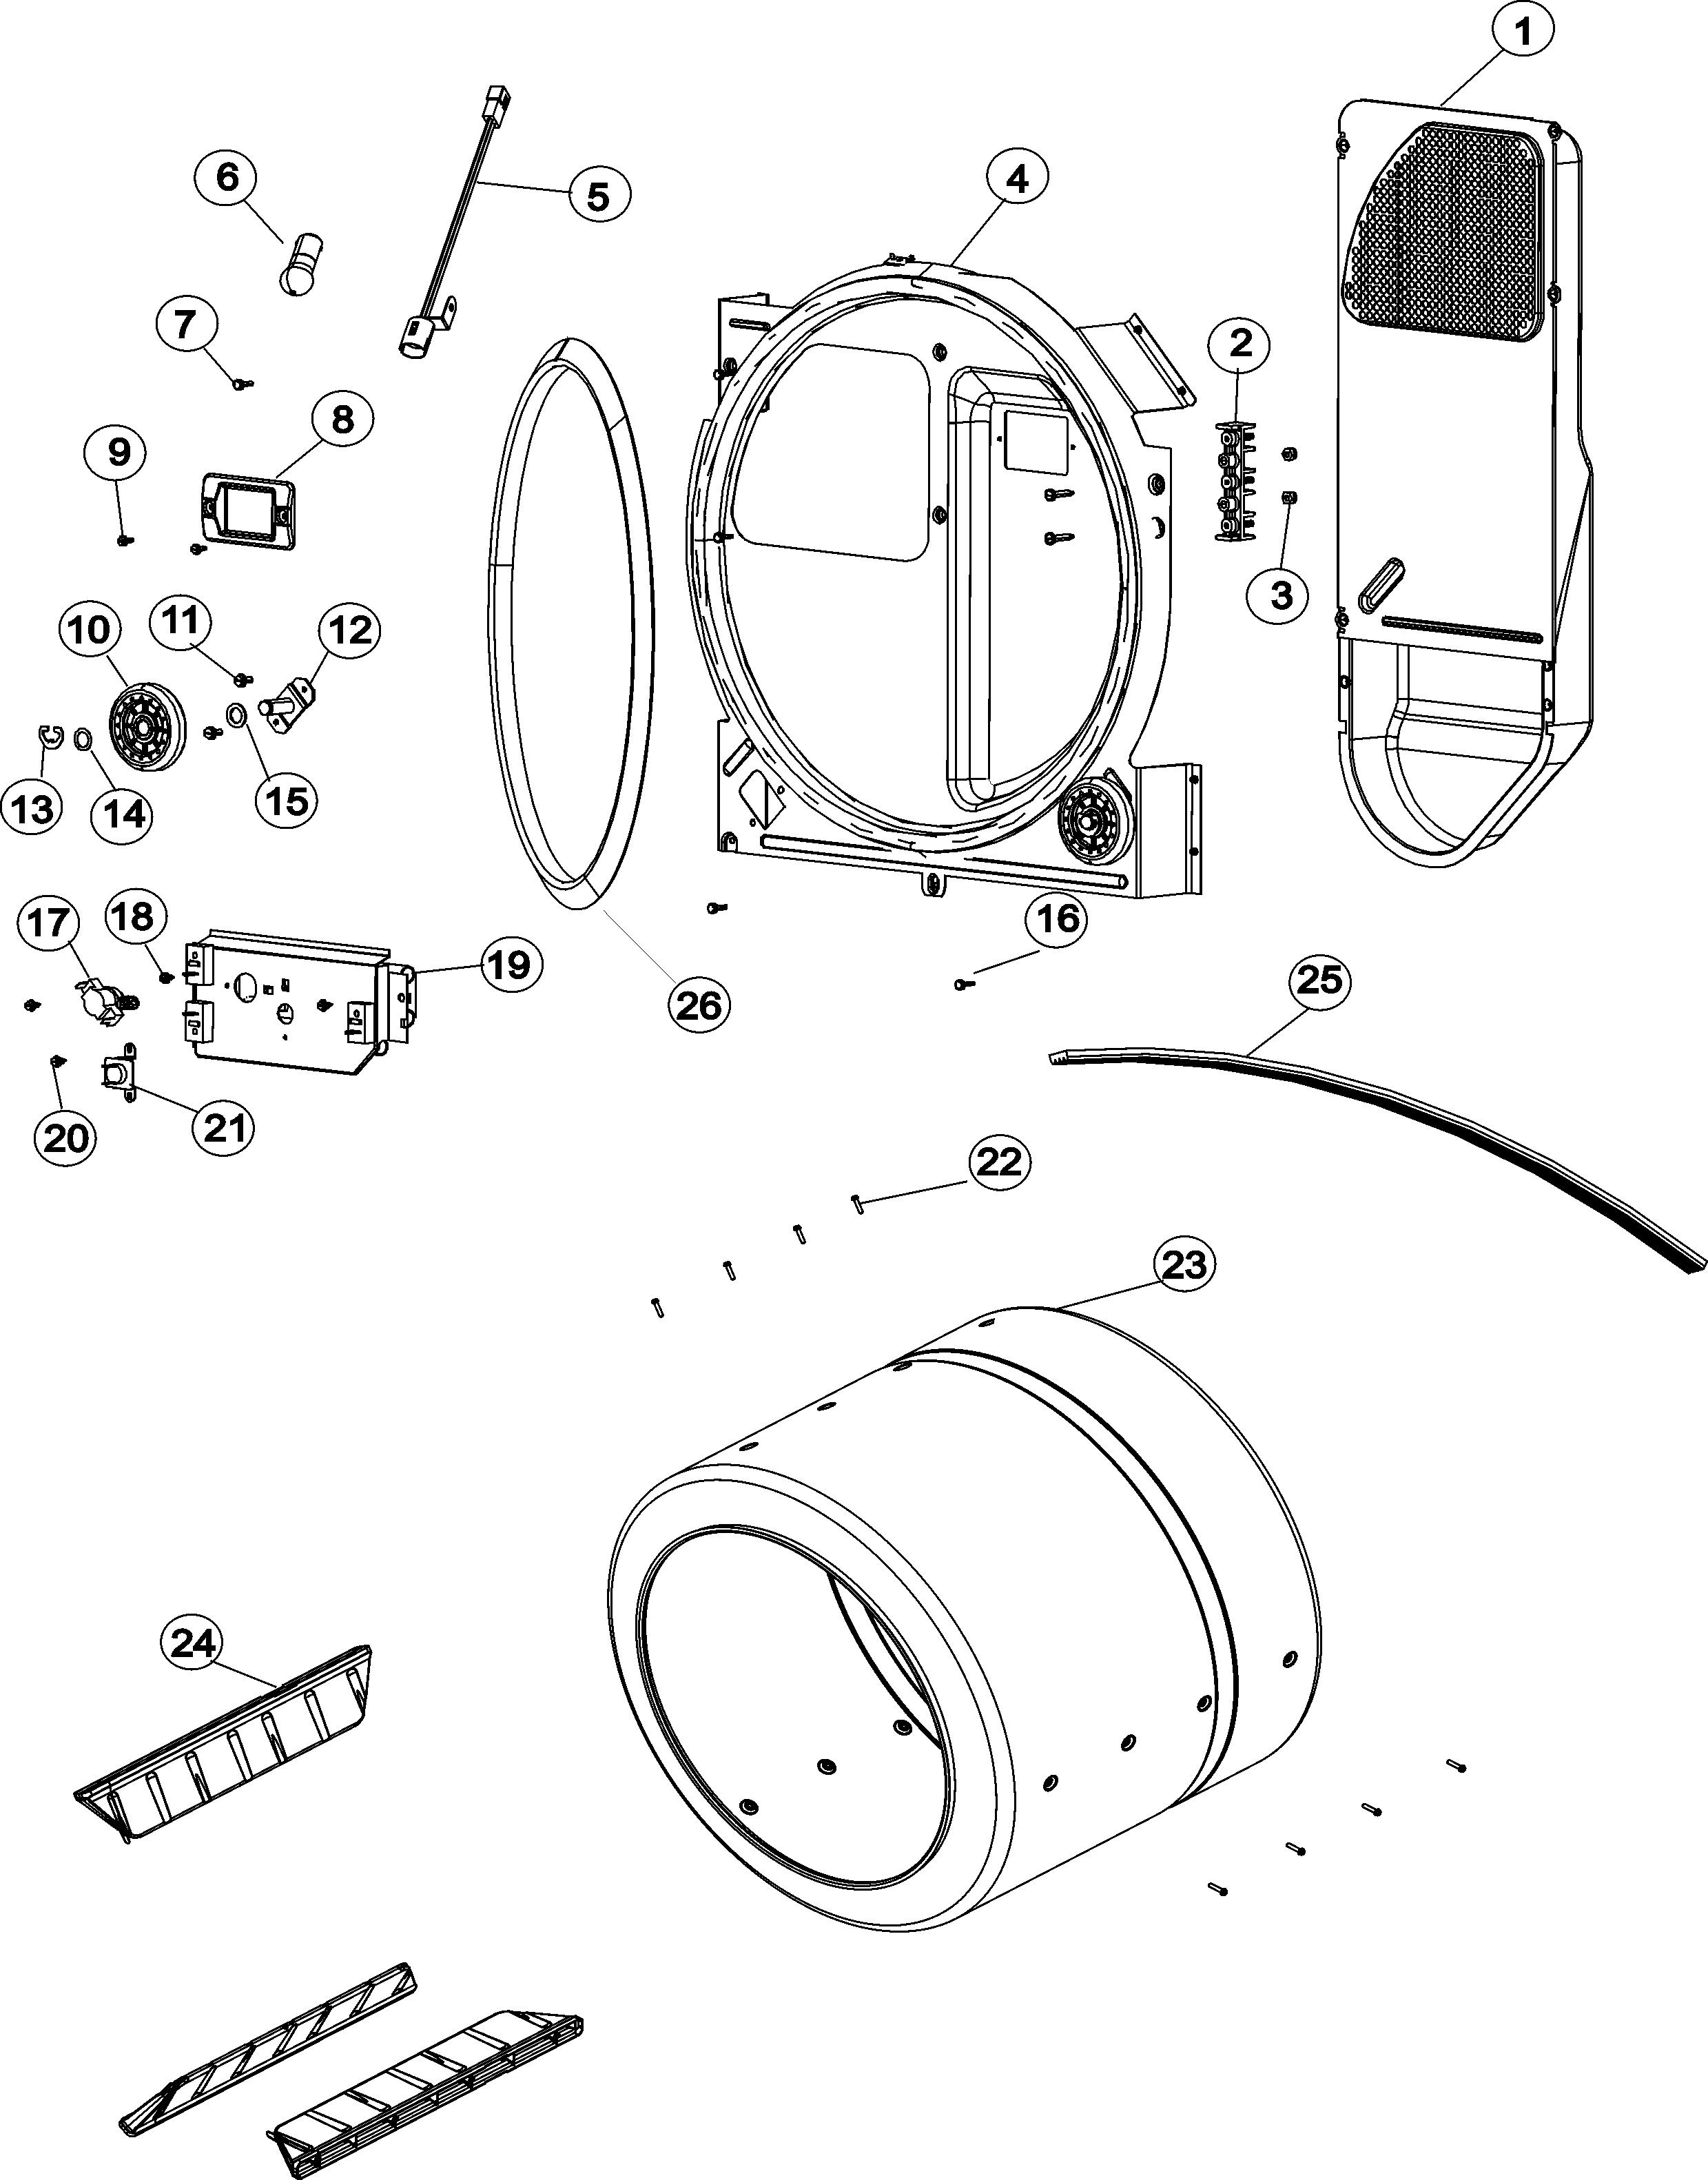 Maytag Neptune Dryer Parts Diagram